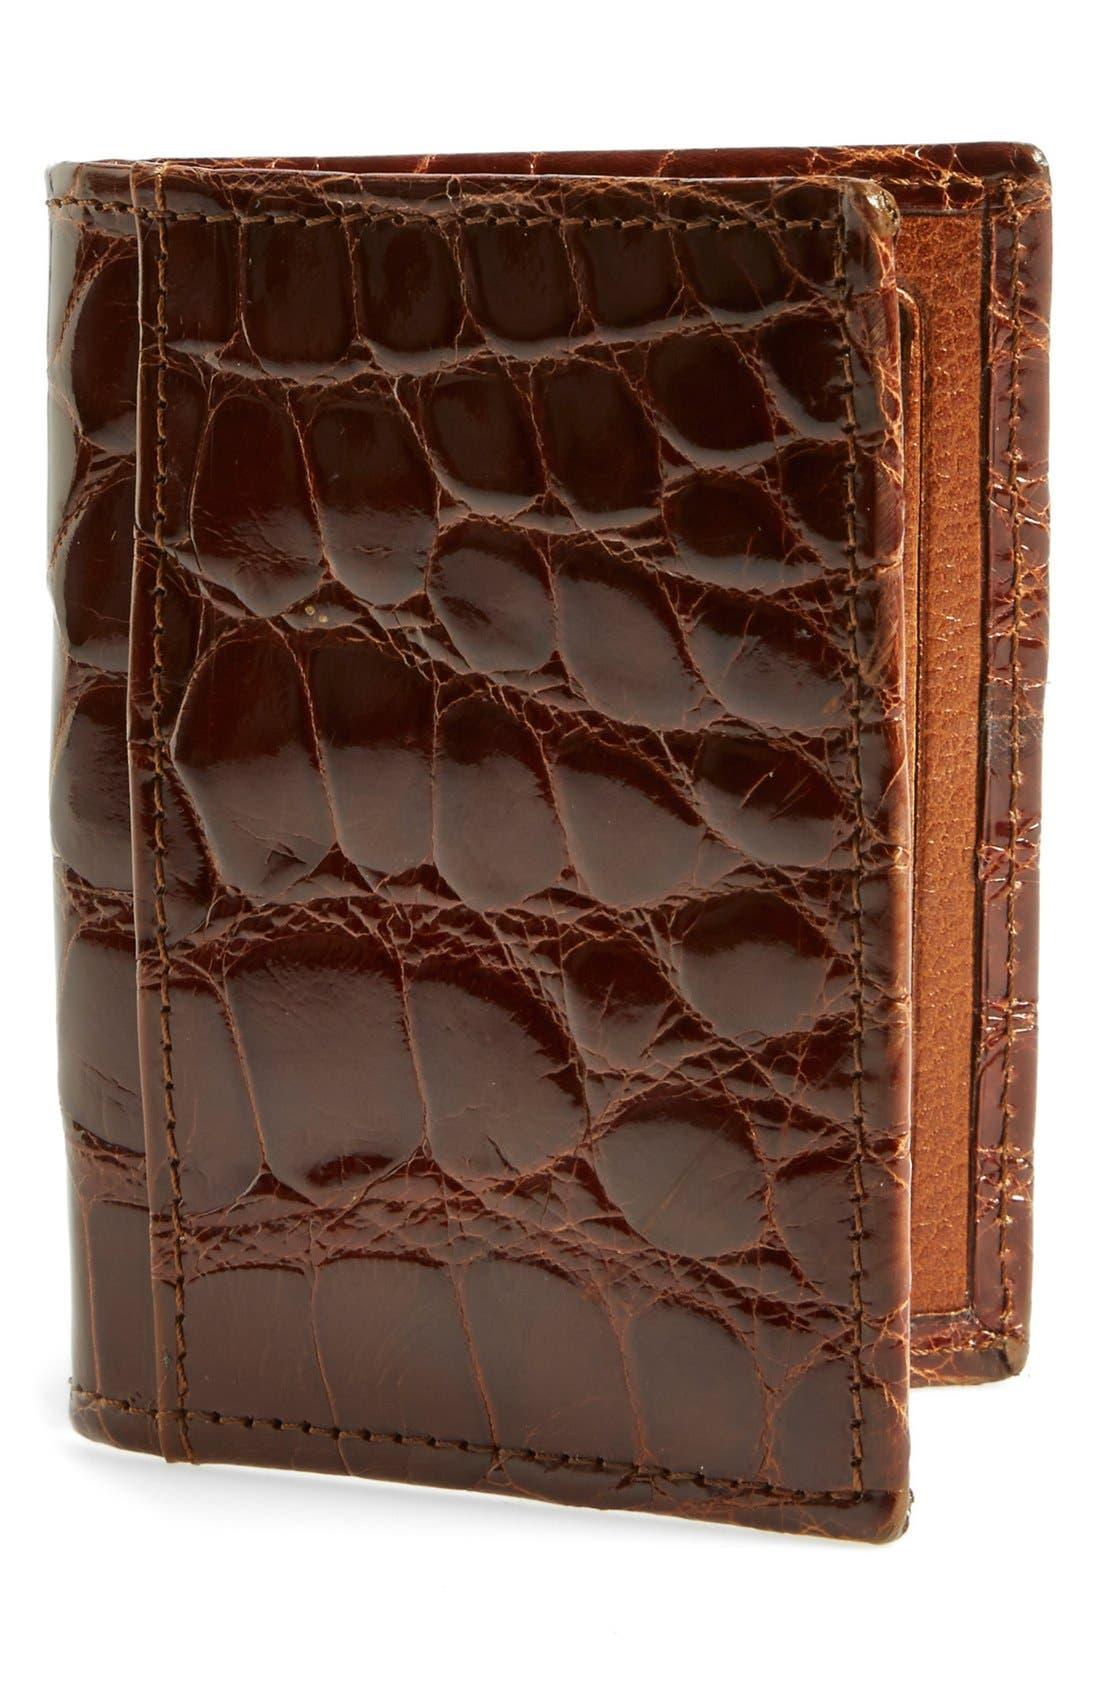 'Joseph' Genuine American Alligator Leather ID Wallet,                             Main thumbnail 1, color,                             COGNAC